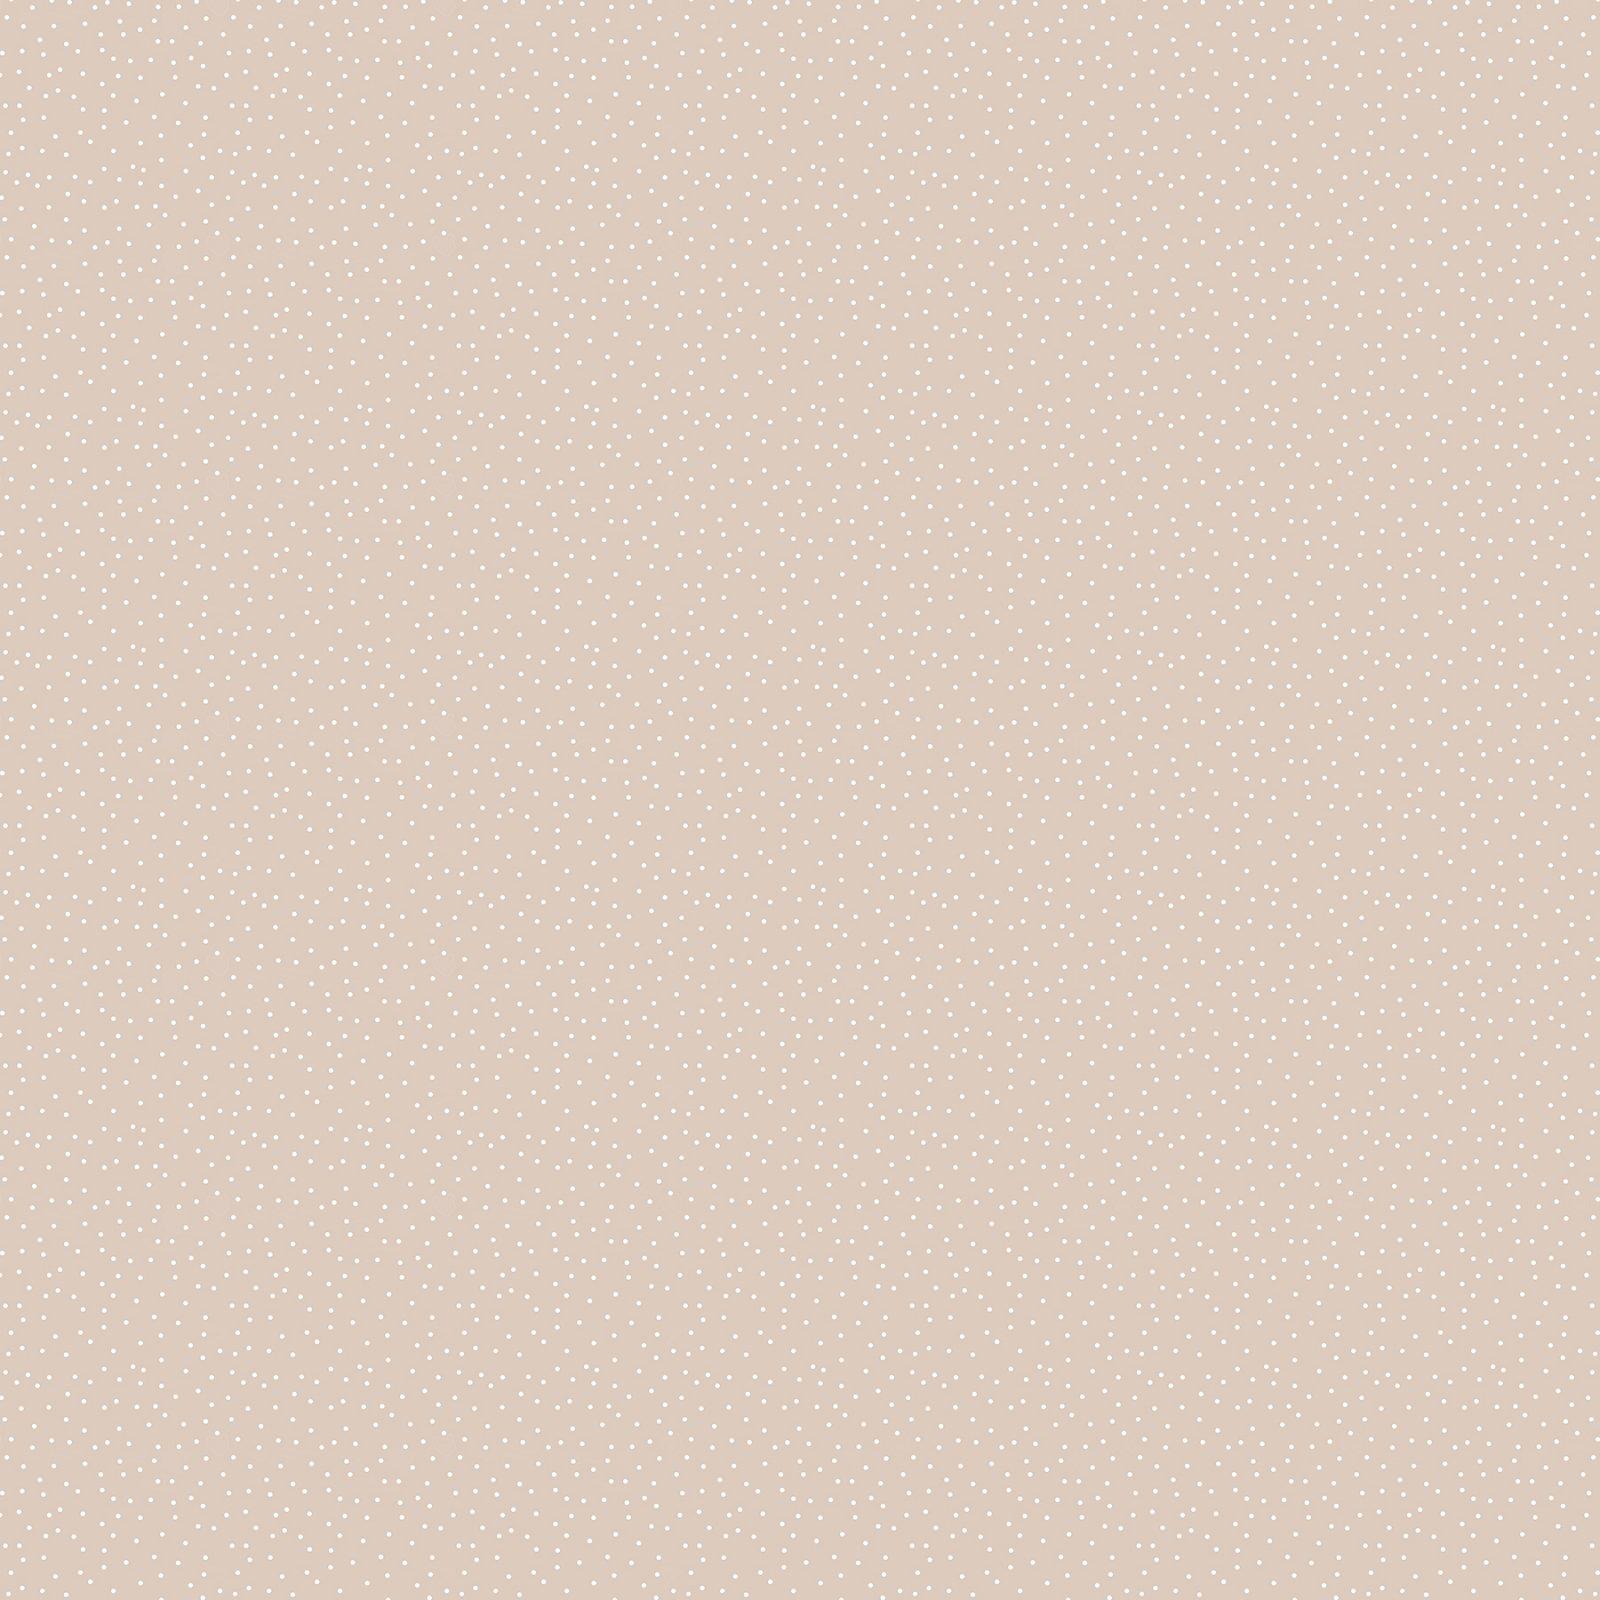 Figo Fabrics - Ghazal Razari - Serenity - Dots Camel